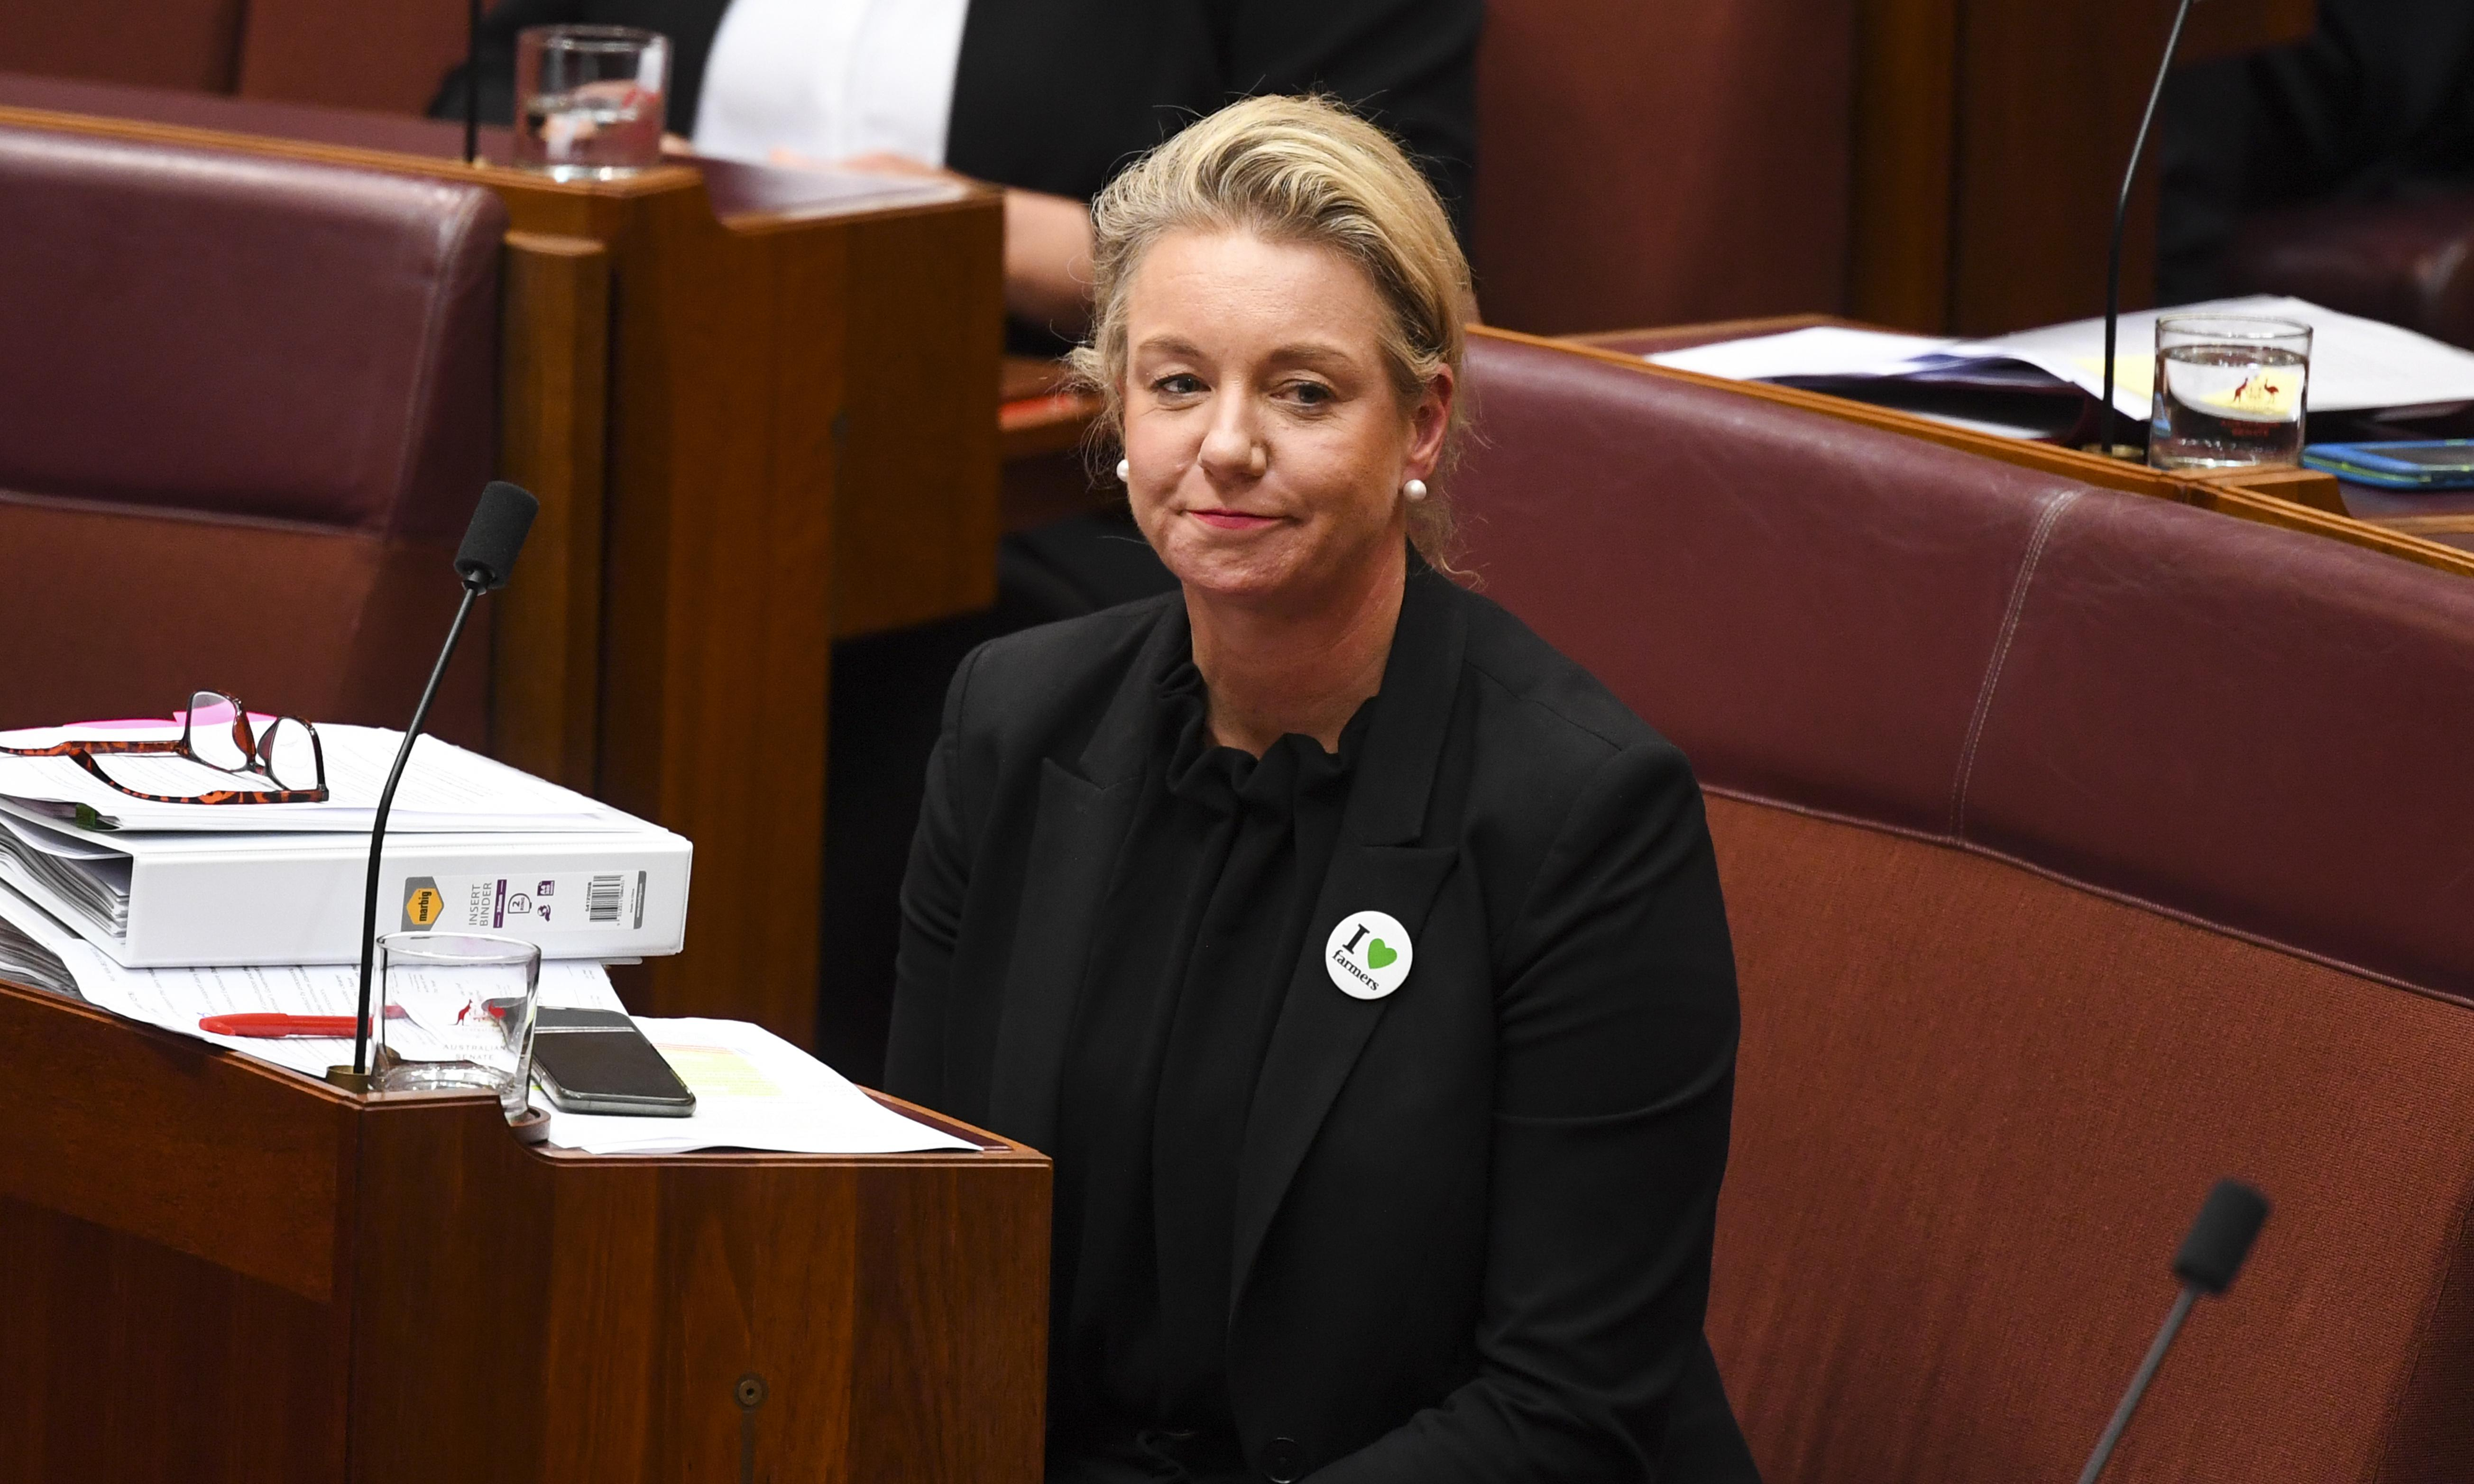 Morning mail: voter anger over sports scandal, Canberra bushfire, biohacking